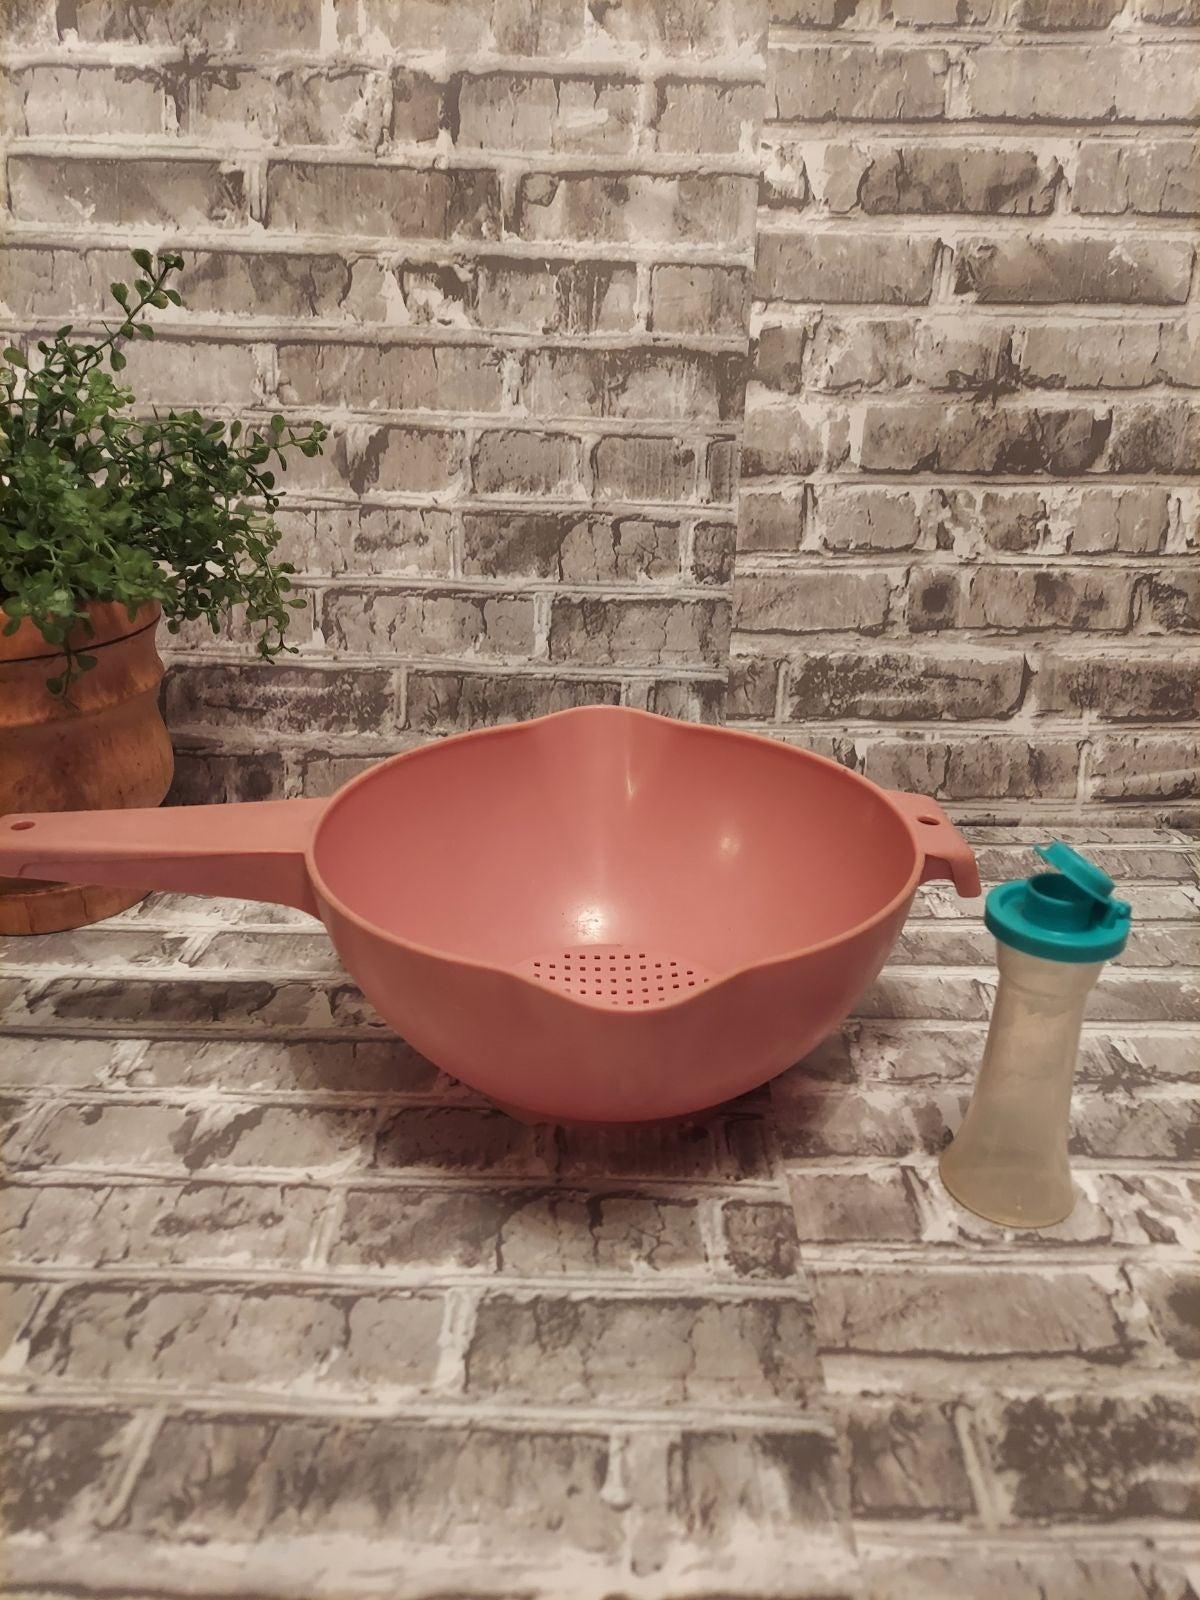 Vintage Tupperware pink strainer